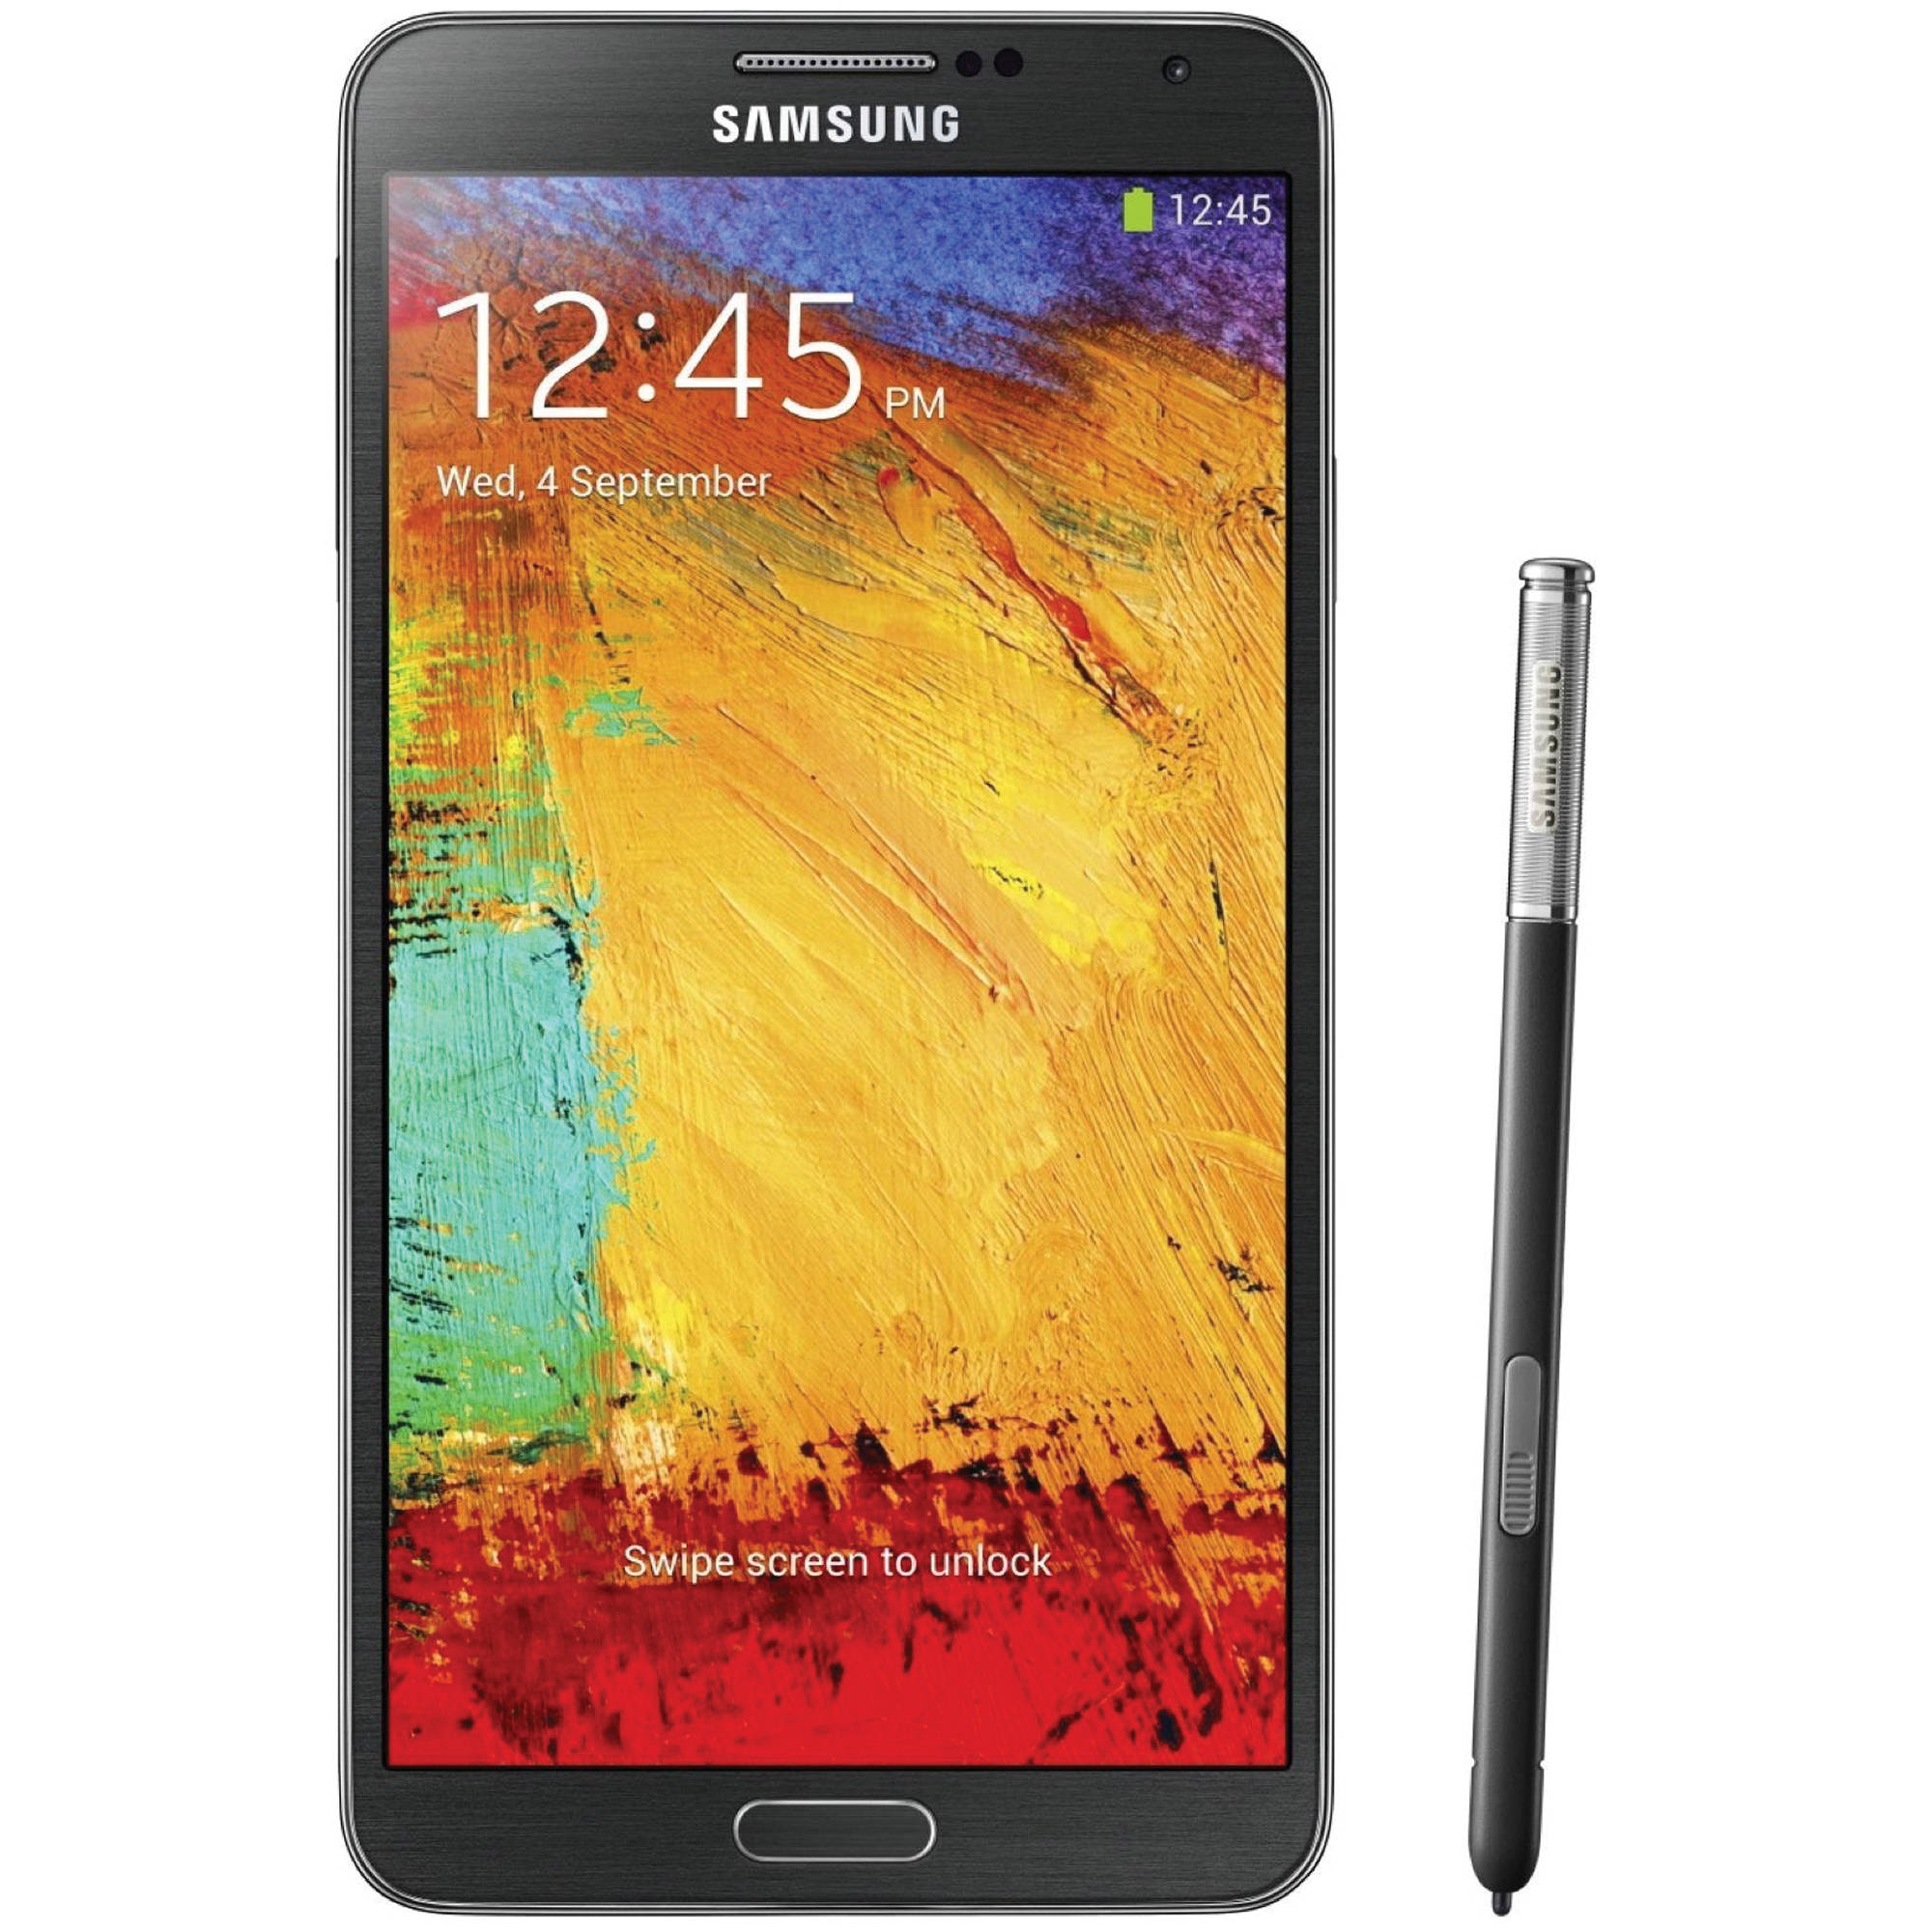 Samsung Galaxy Note 3 N900A 32GB AT&T Branded Smartphone (Unlocked, Black)